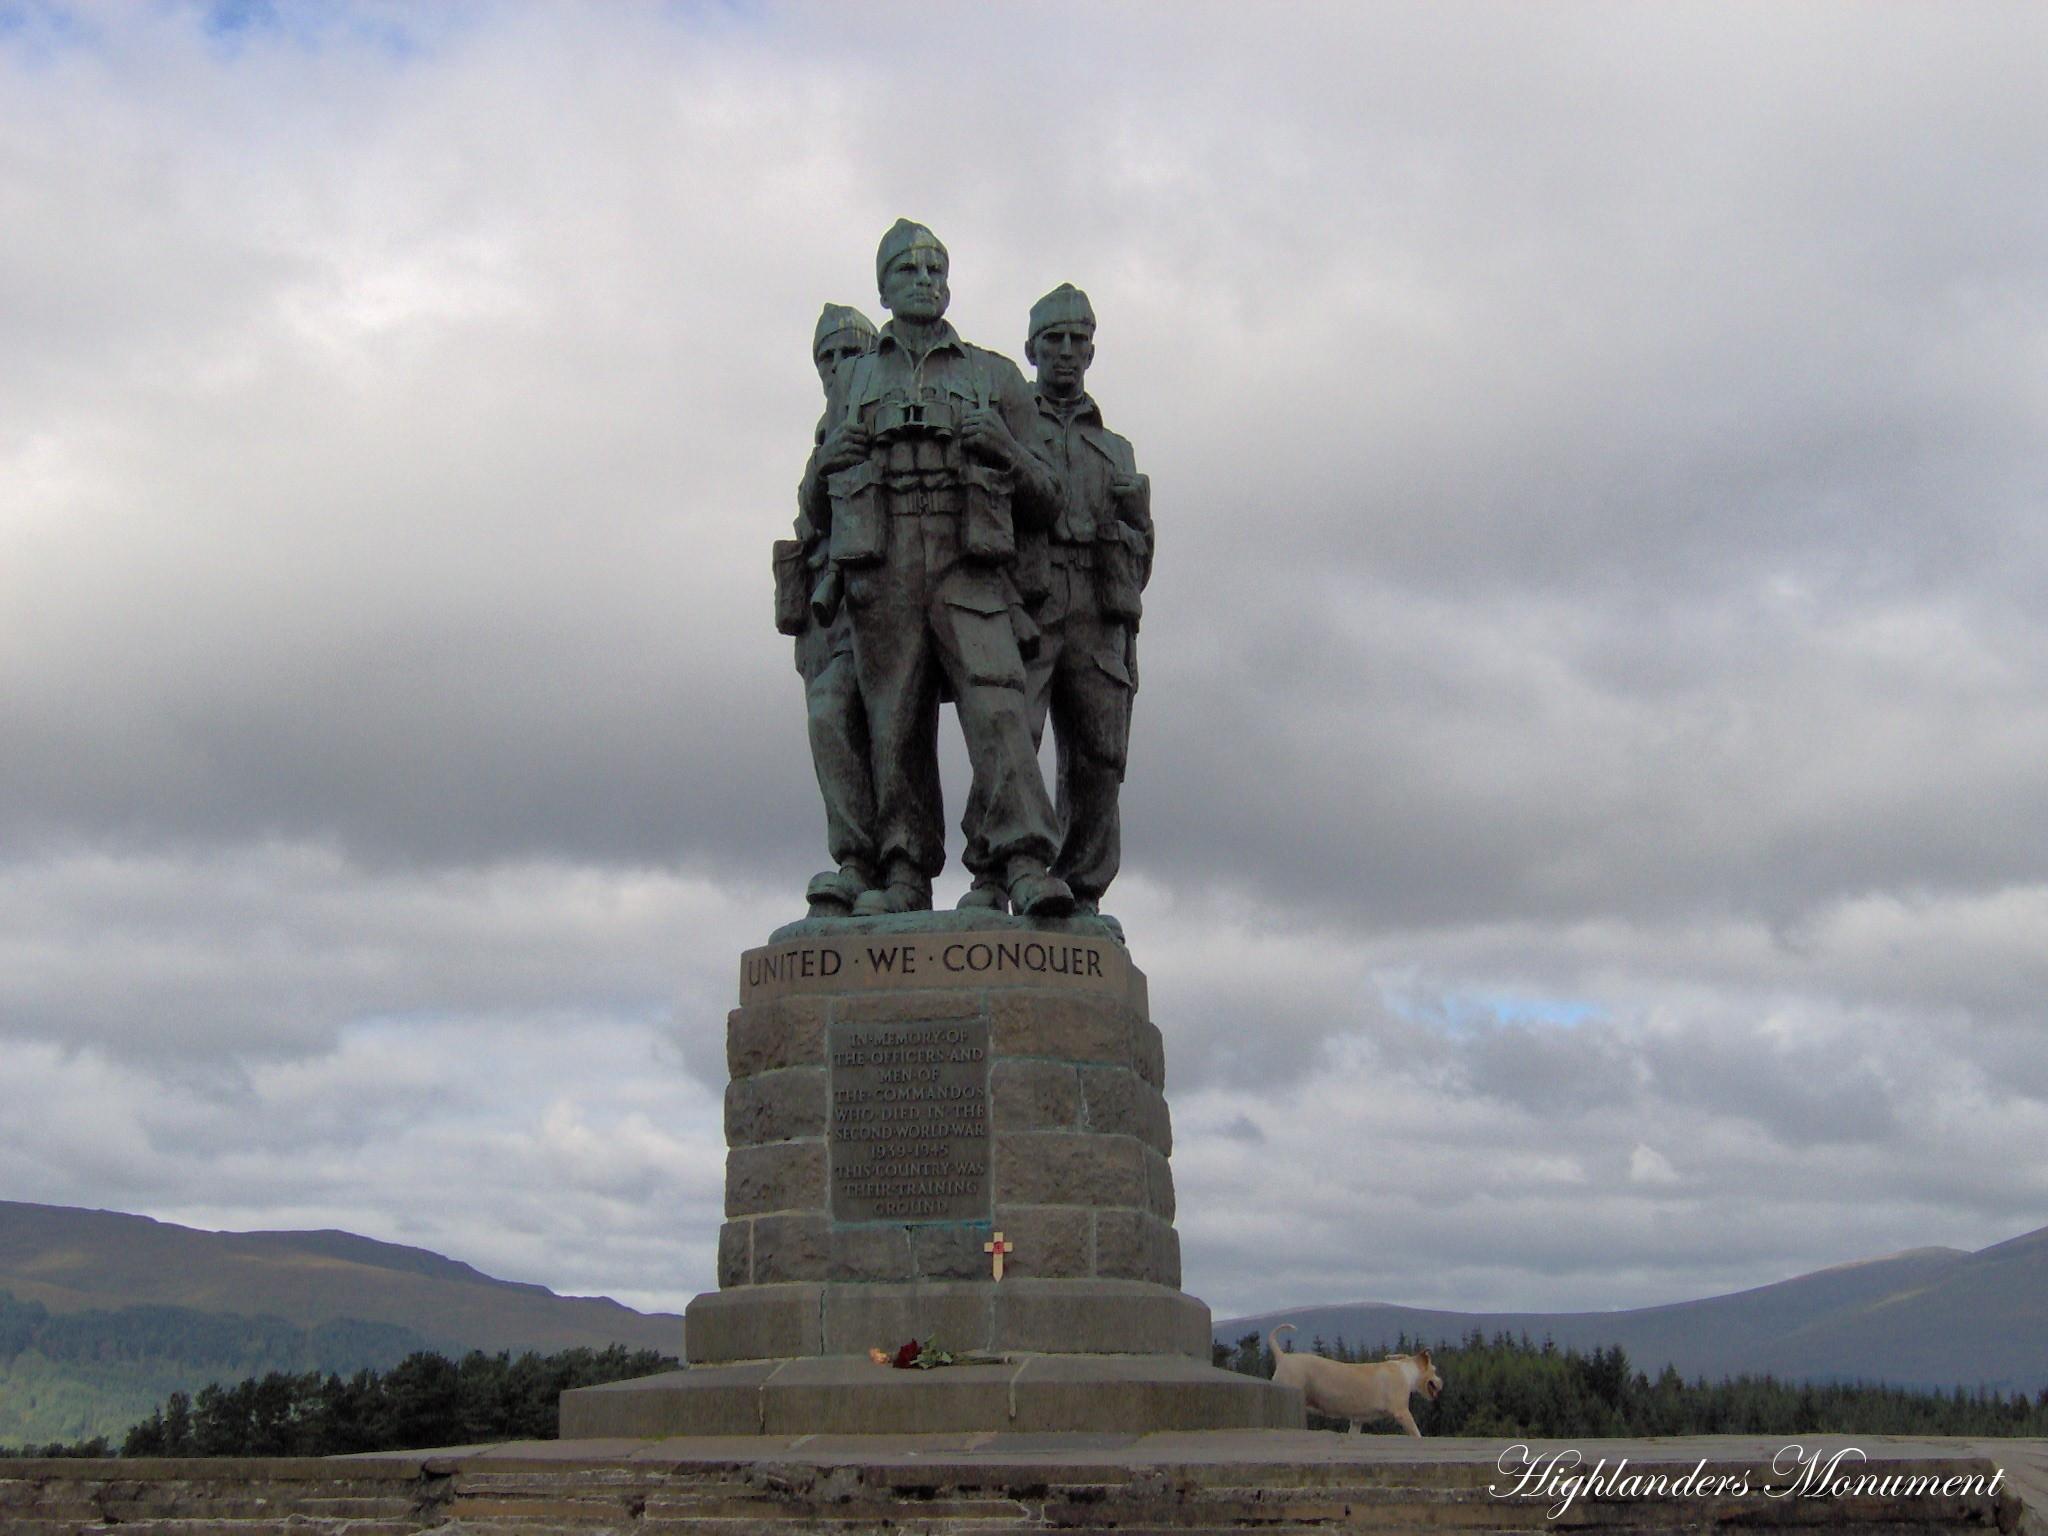 Highlanders Monument